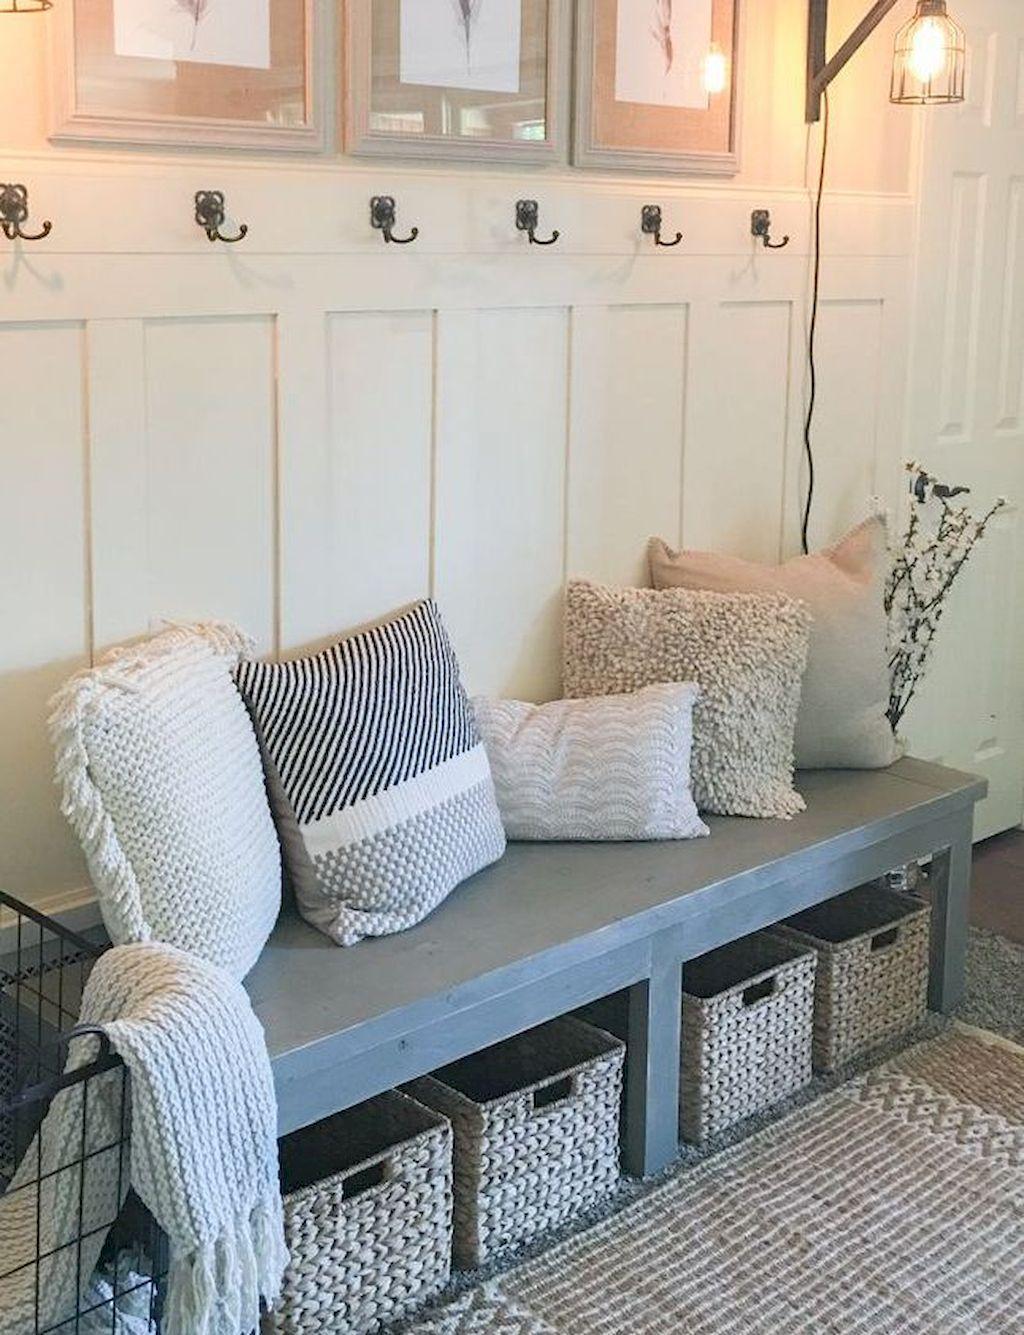 80 Rustic Small Mudroom Bench Ideas Home decor, Home